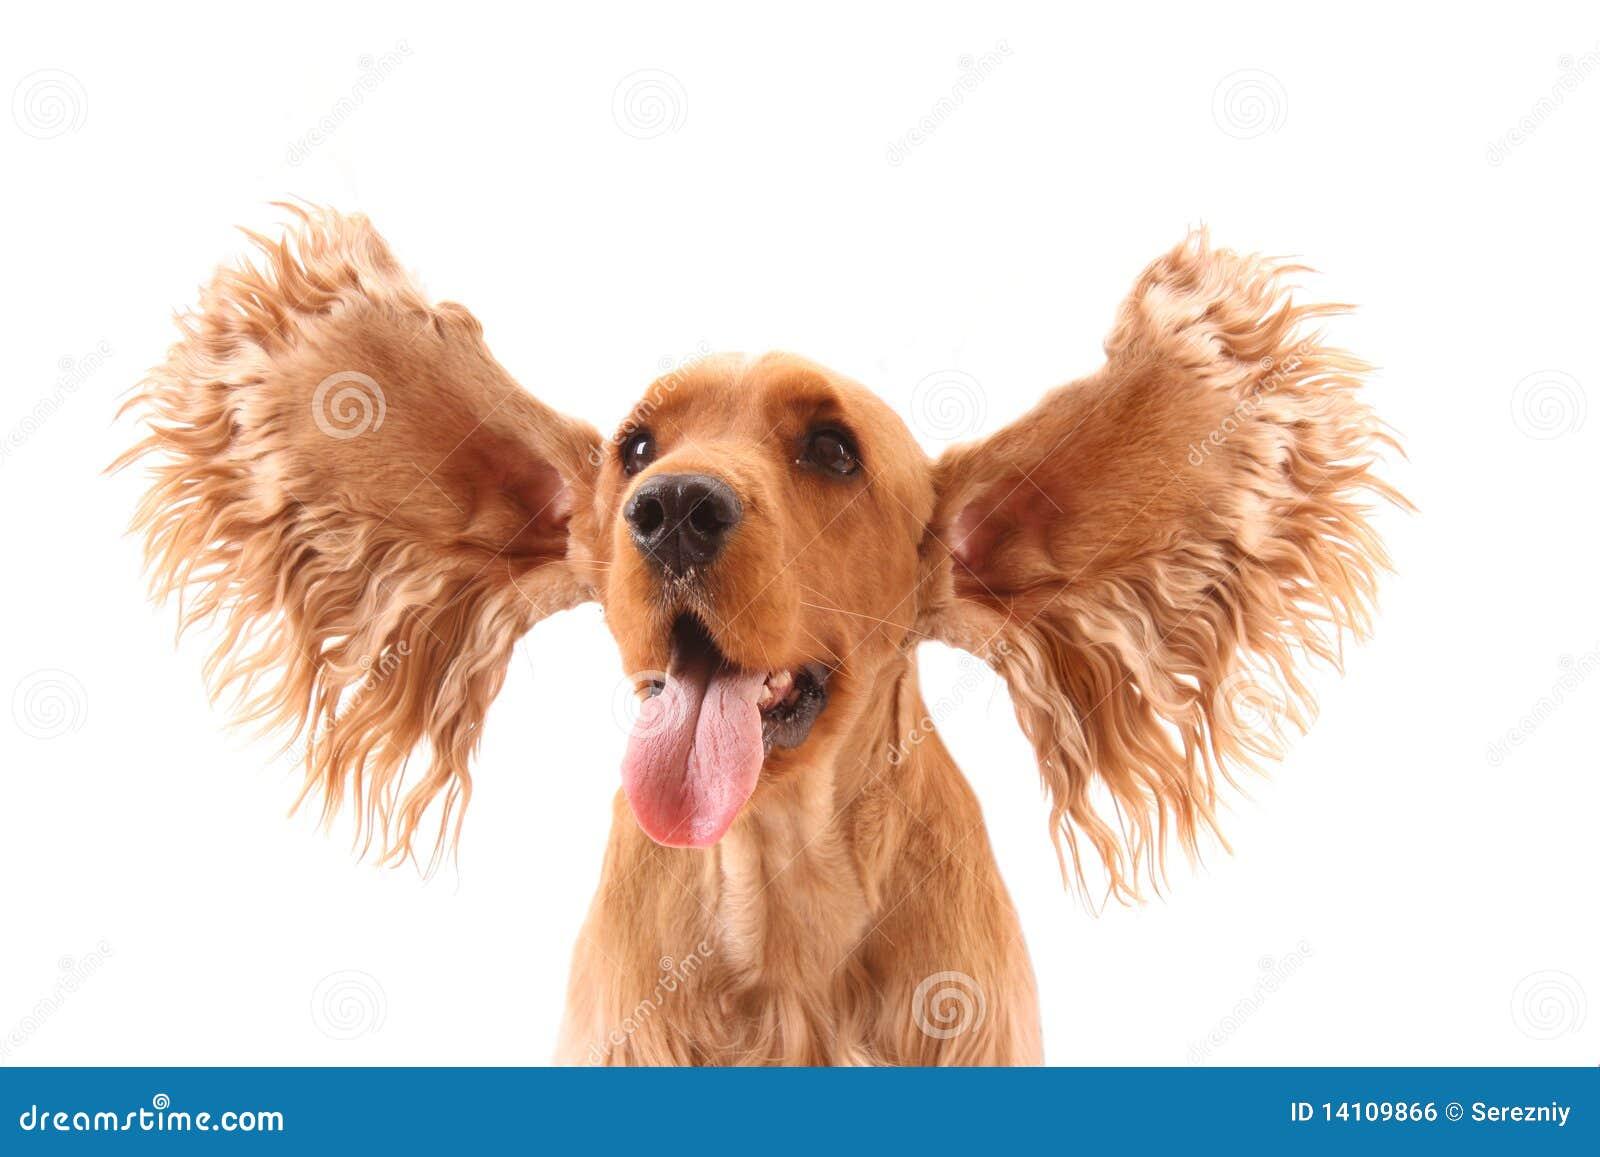 Cocker spaniel with big ears